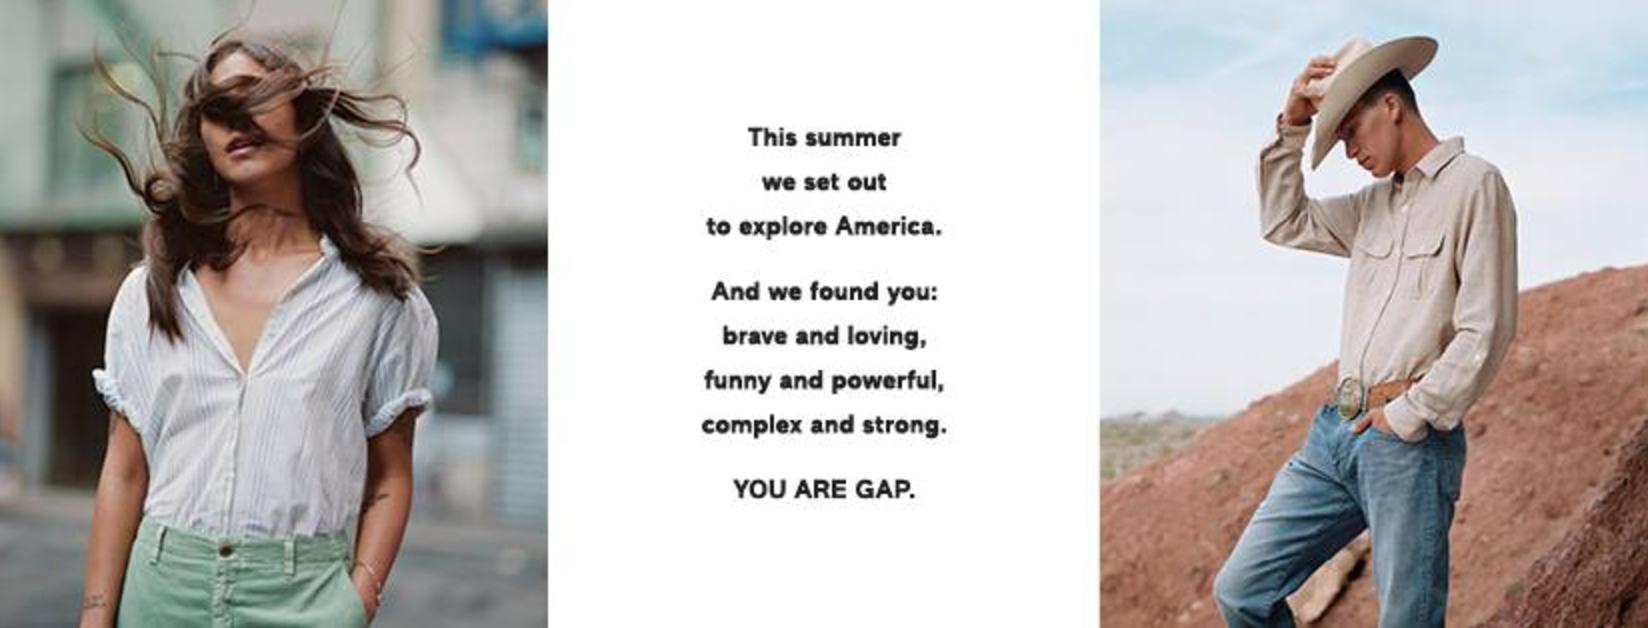 gap summer marketing.png